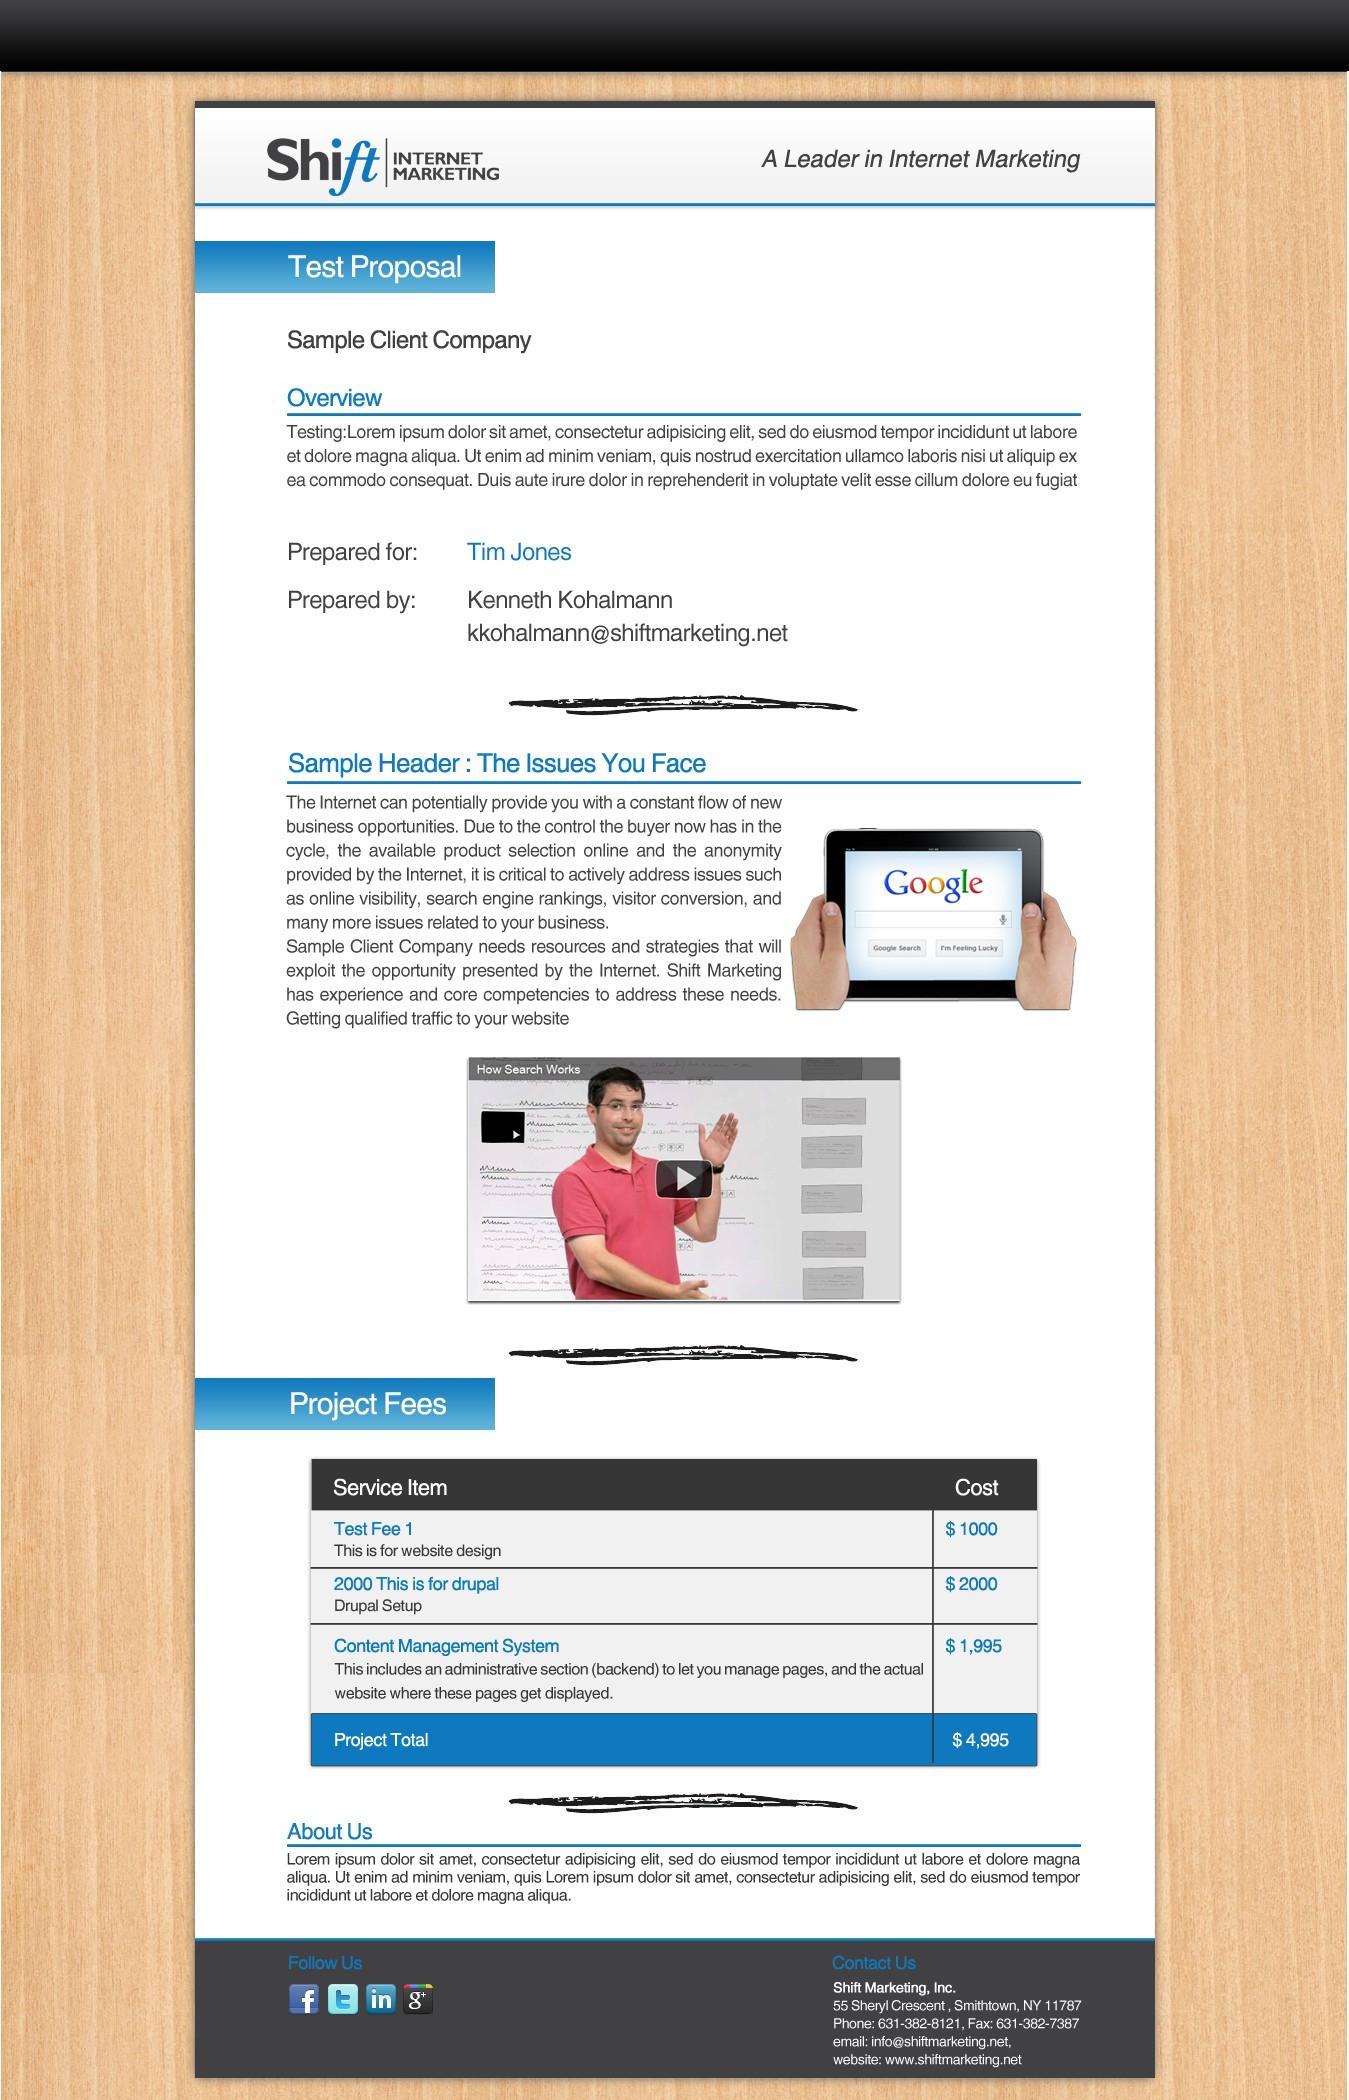 Proposal Design for Shift Marketing Inc.